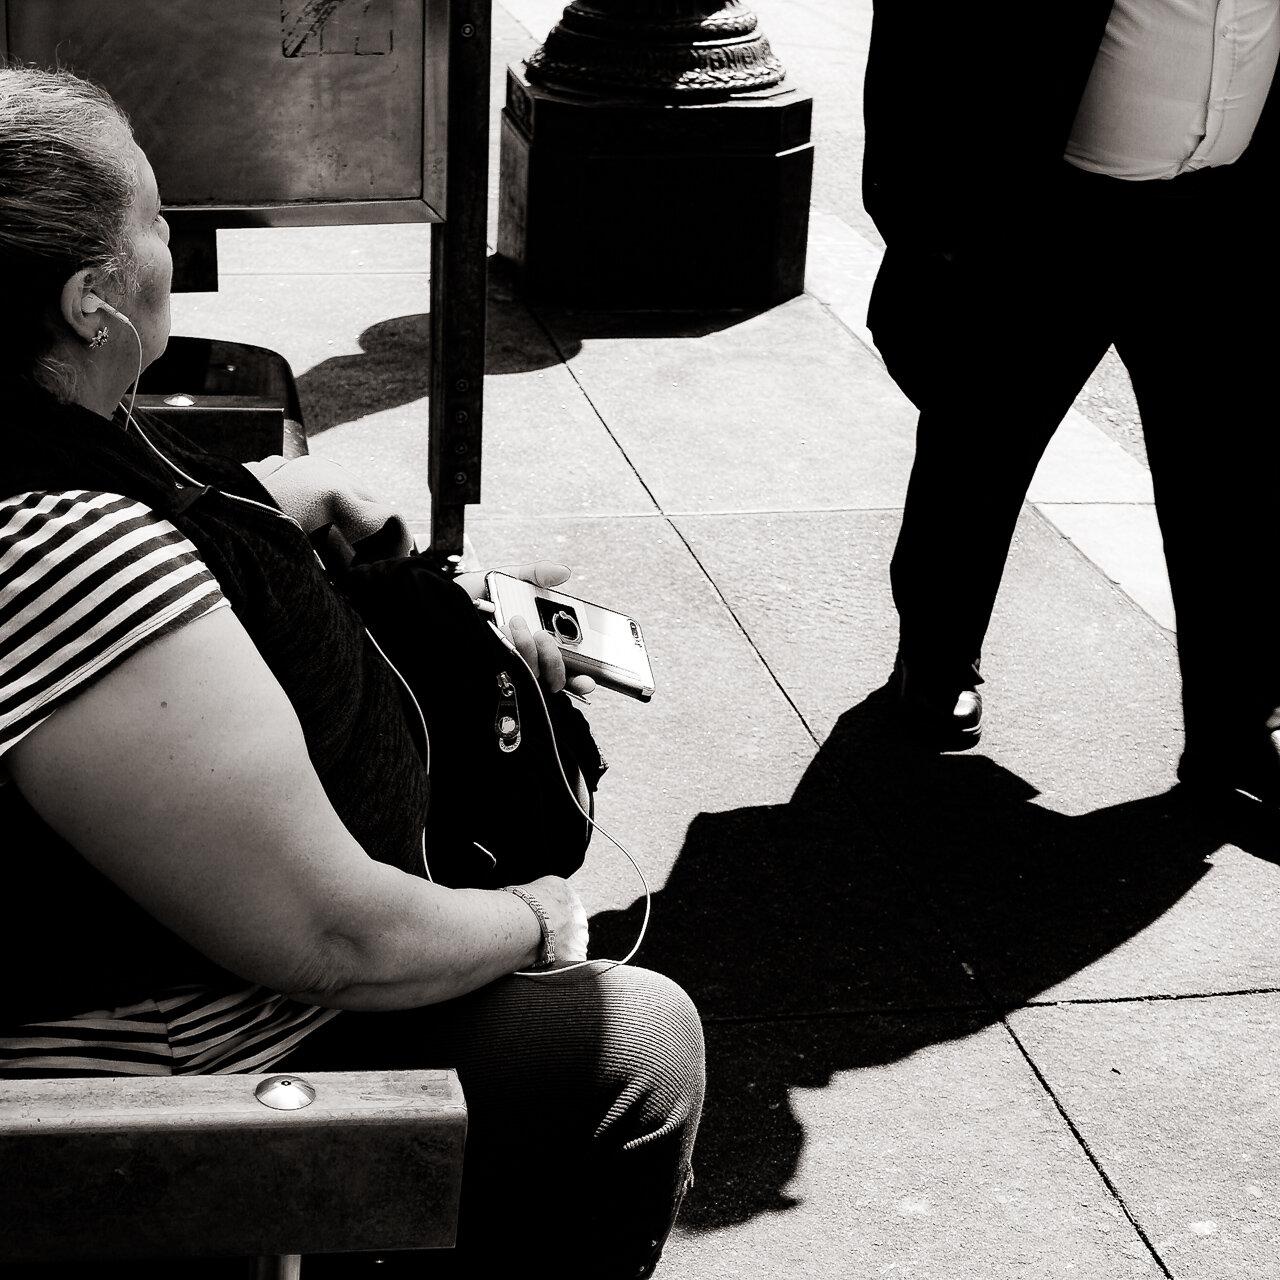 USA, California, San Francisco, Kalifornien, America, Amerika, streetphotography, Straßenfotofotografie, street, Straße, Alltag, everyday life, photo, Foto, photography, Fotografie, people, Menschen-bondarenko-ps_de+00072+_P2M5265.jpg